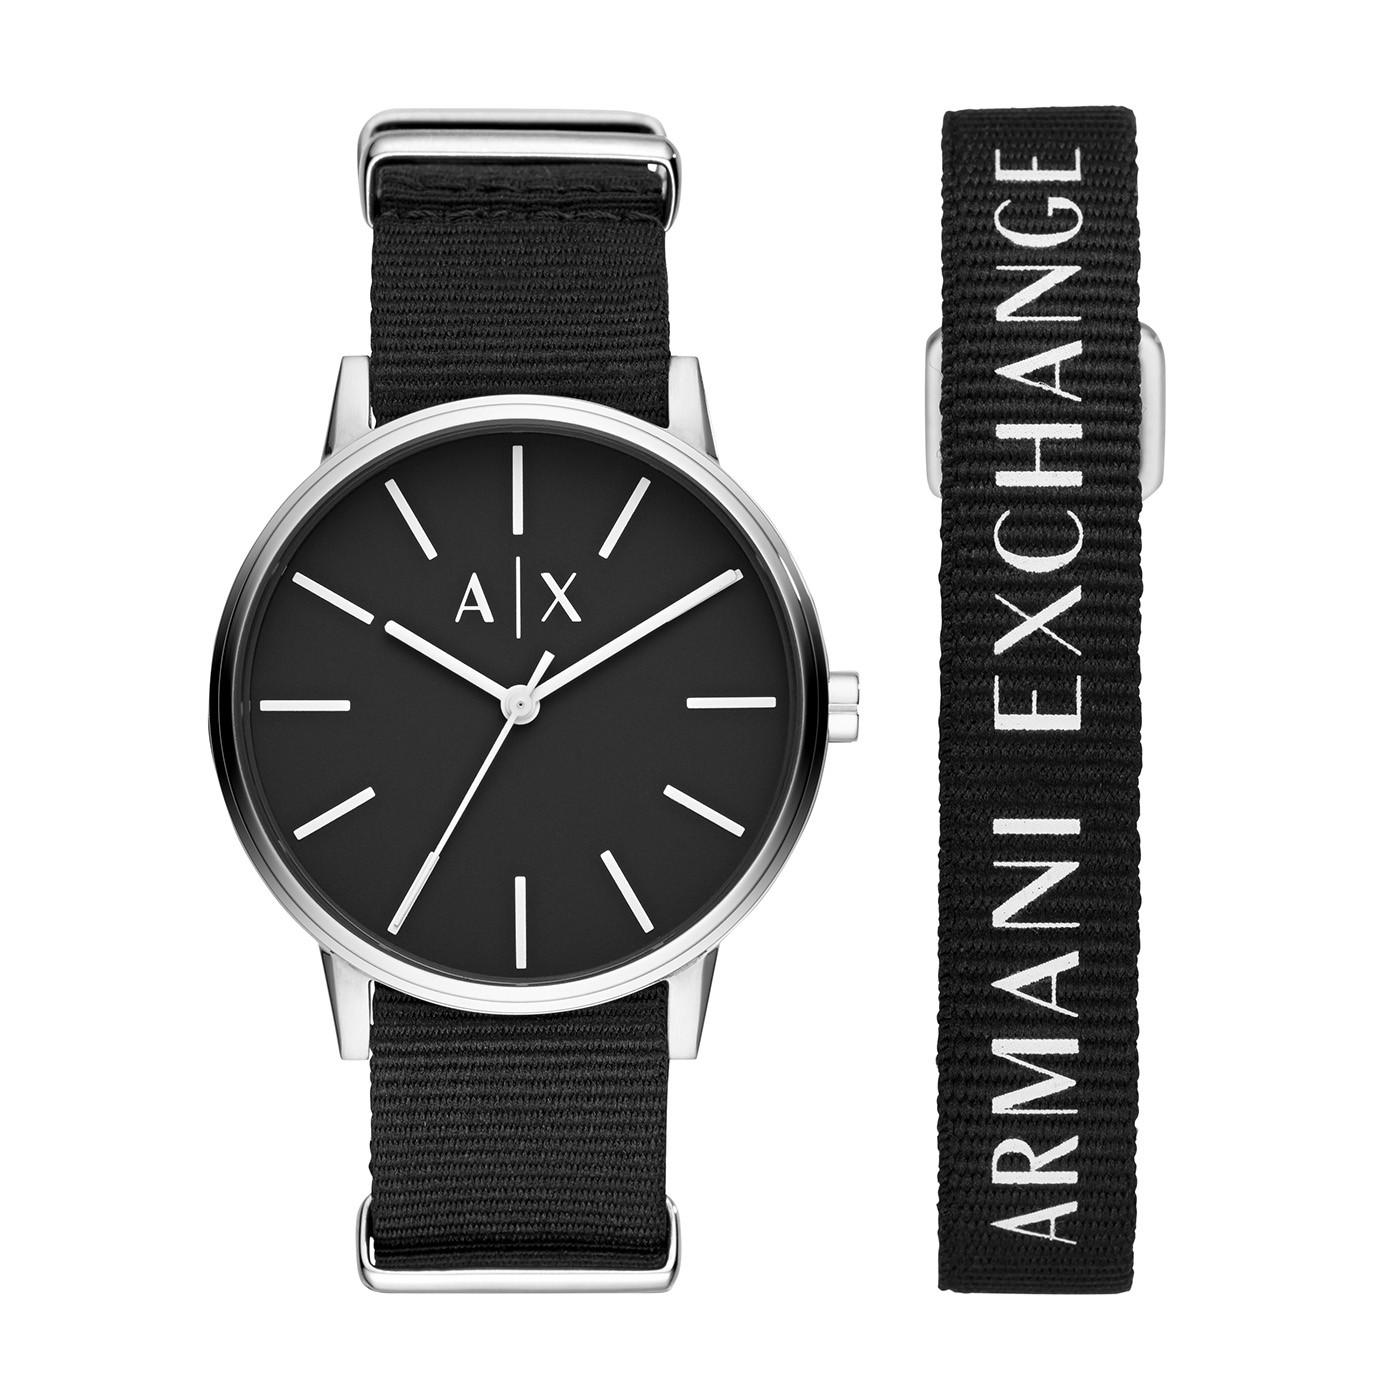 Armani Exchange Cayde horloge AX7111